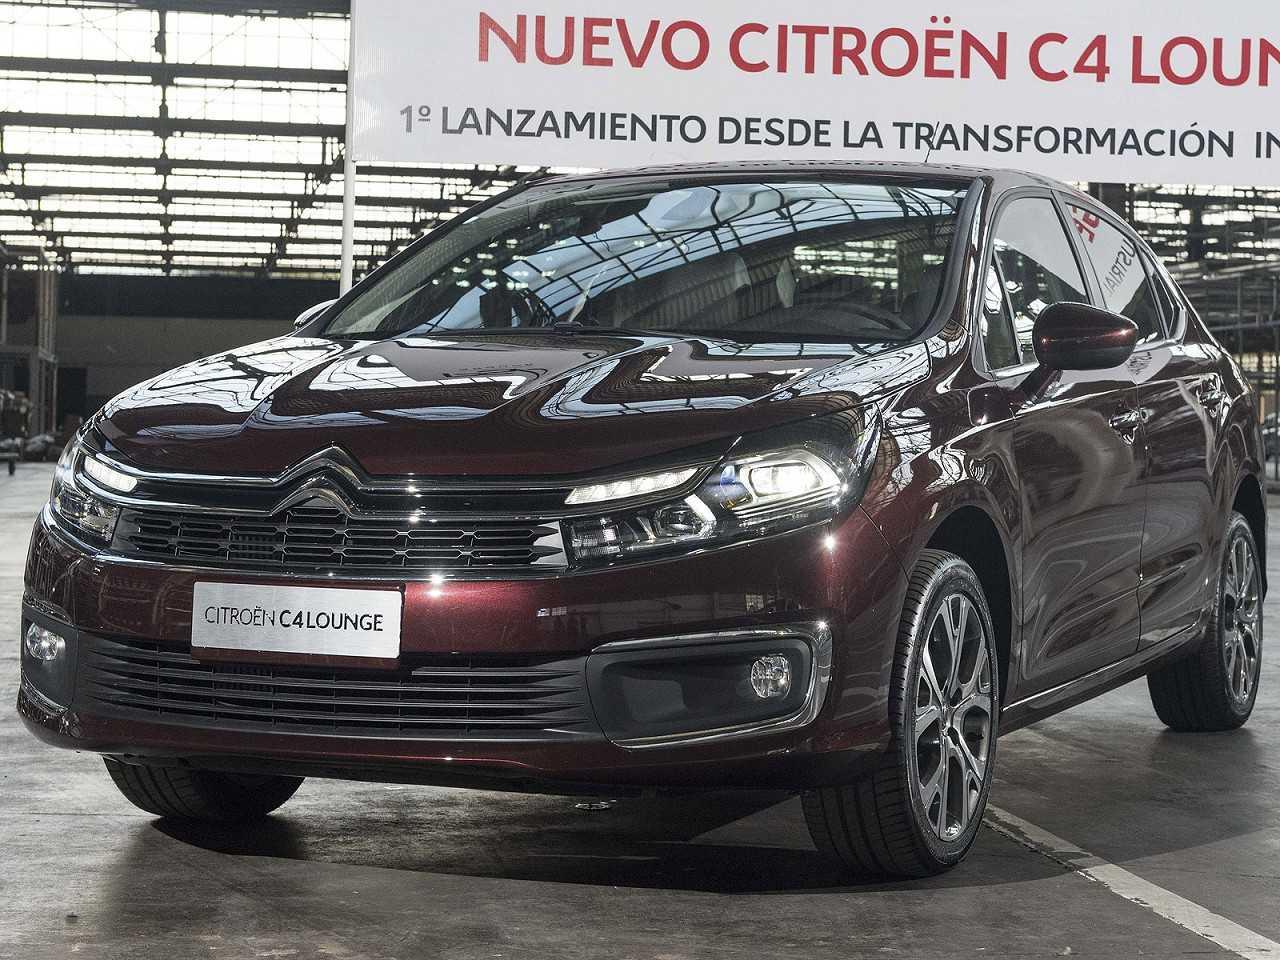 CitroënC4 Lounge 2019 - ângulo frontal